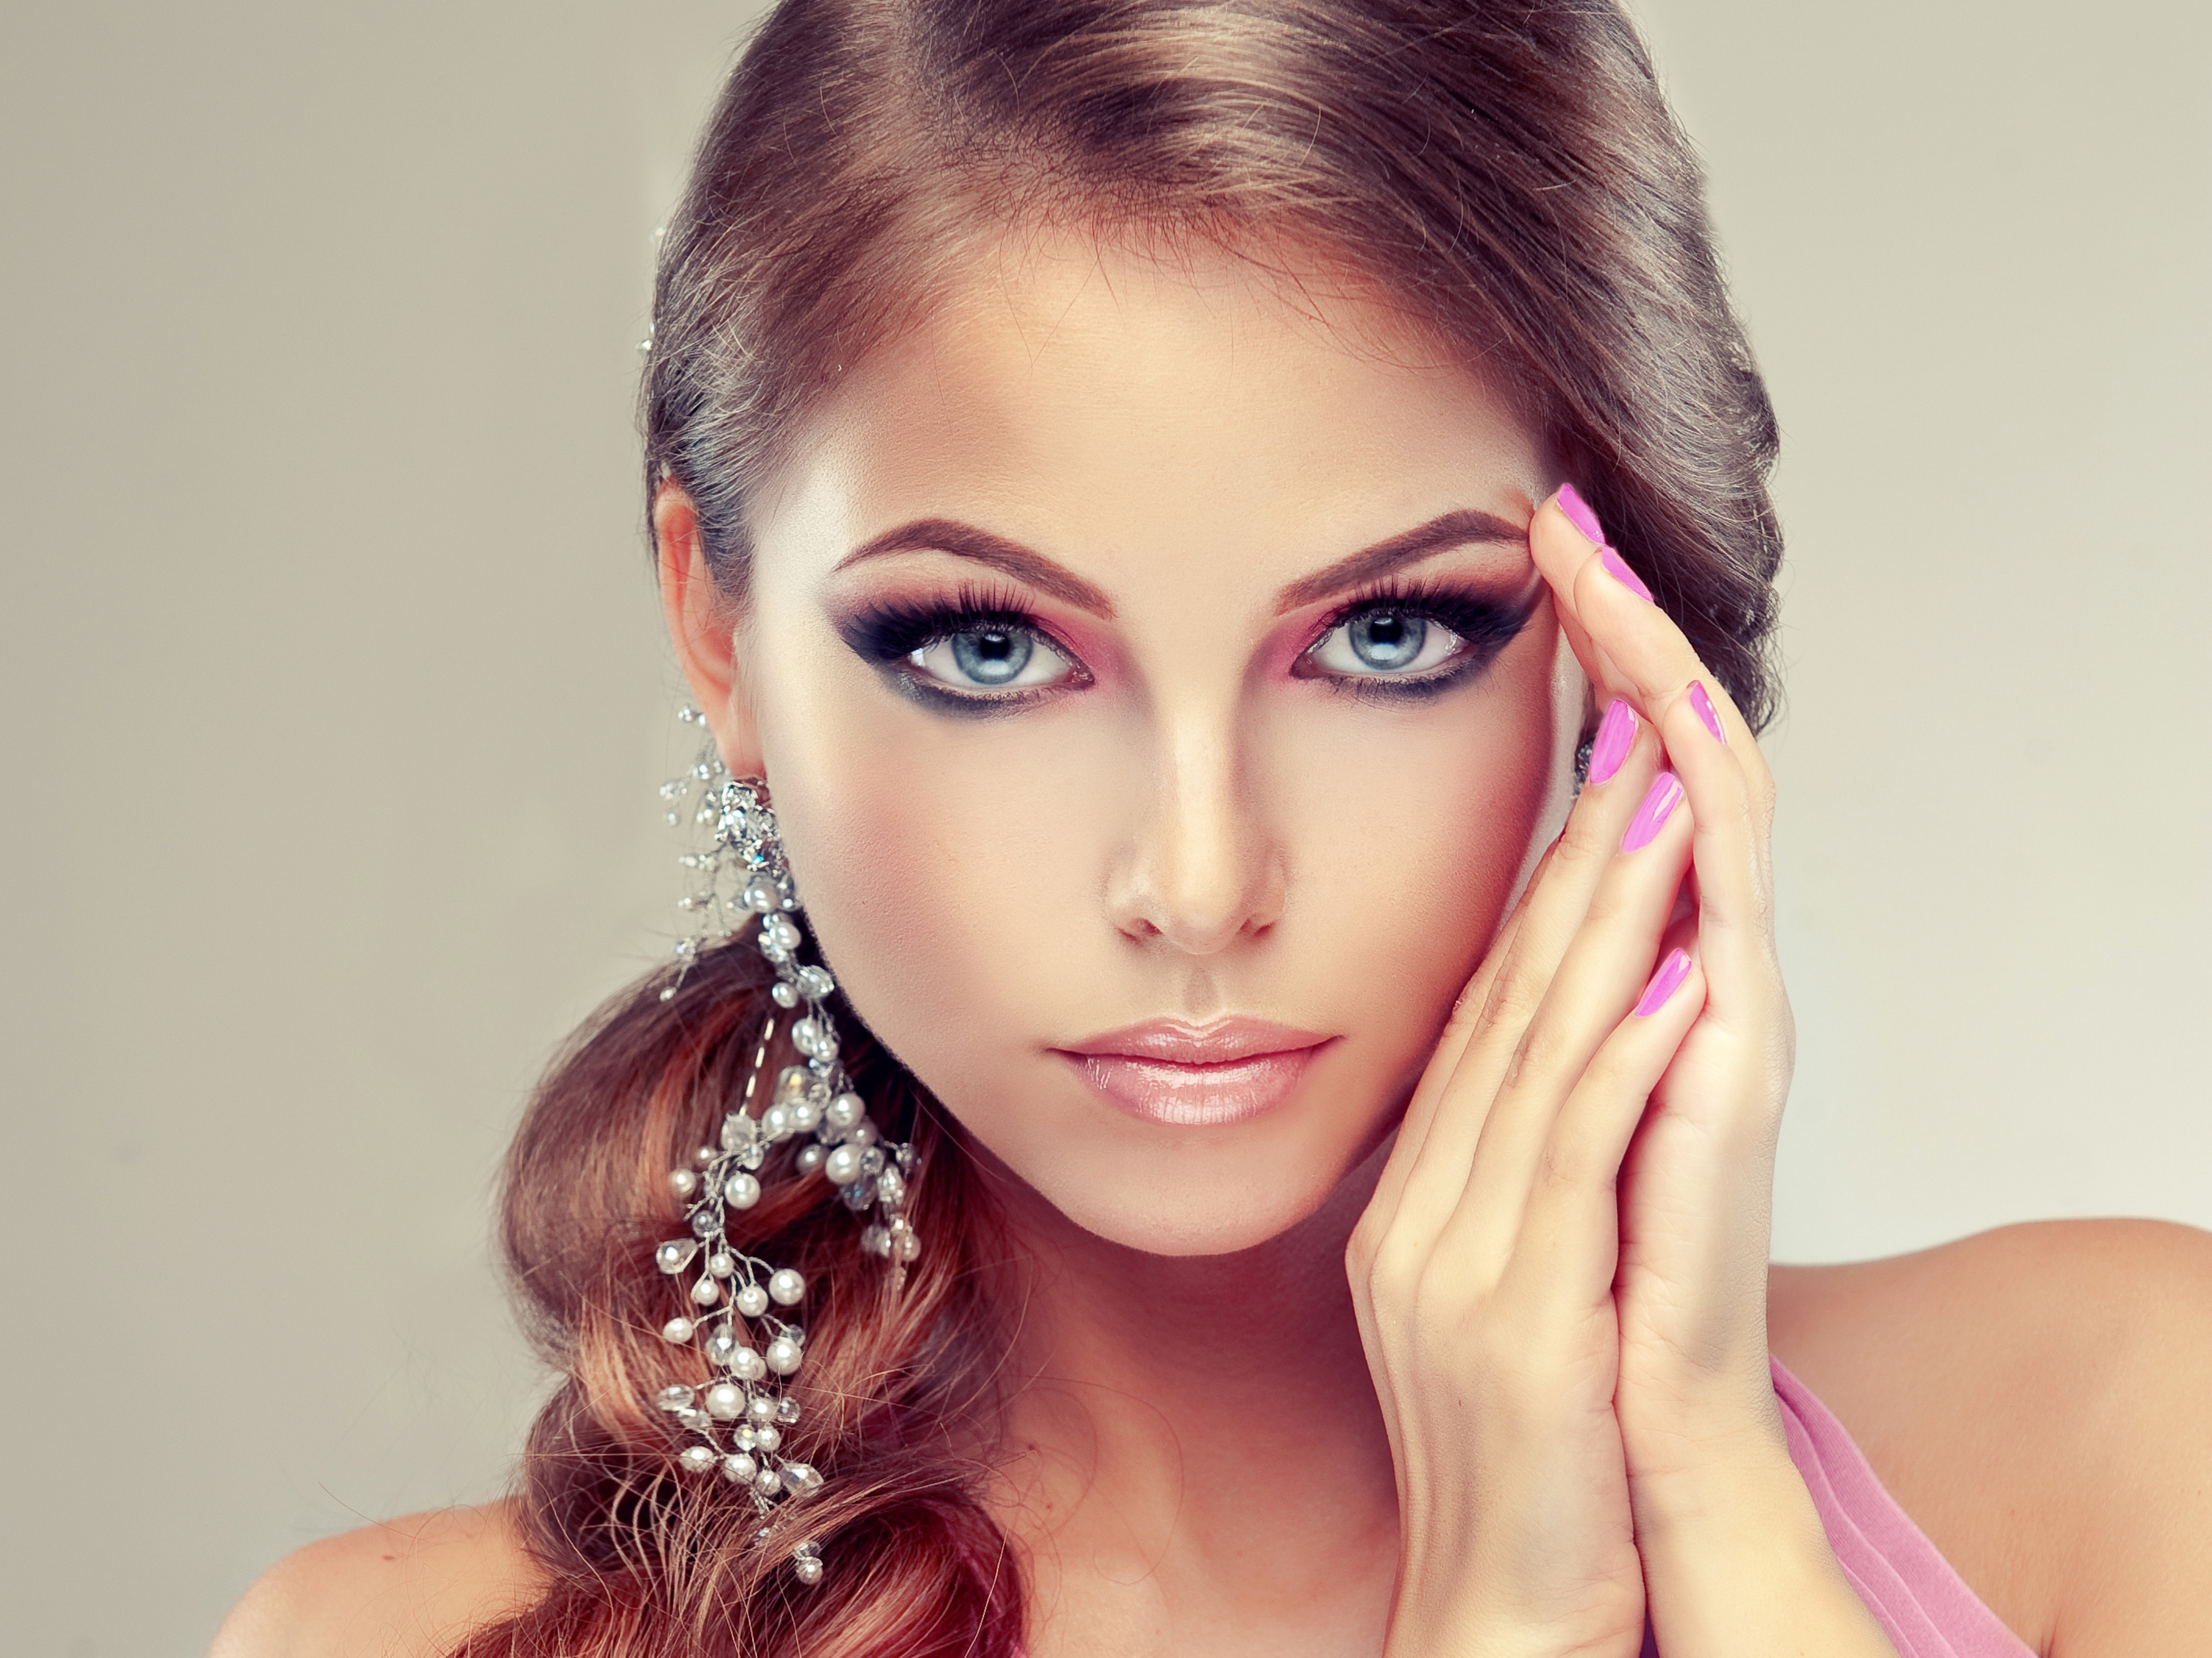 Салон красоты девушки